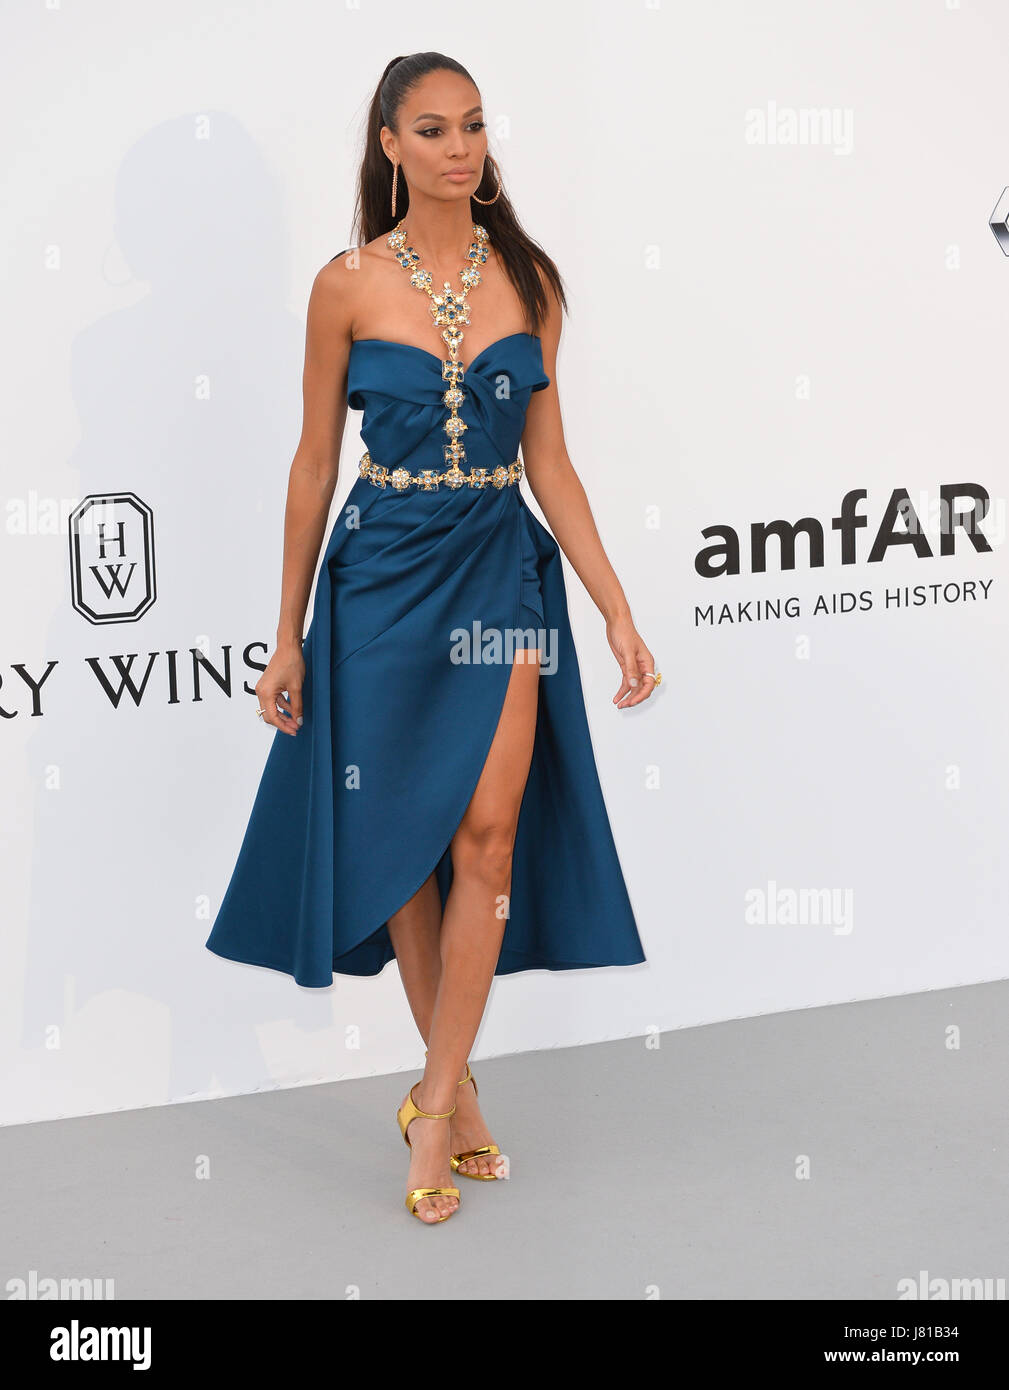 18221631fbe Amfar Gala Cannes 2017 Stock Photos   Amfar Gala Cannes 2017 Stock ...